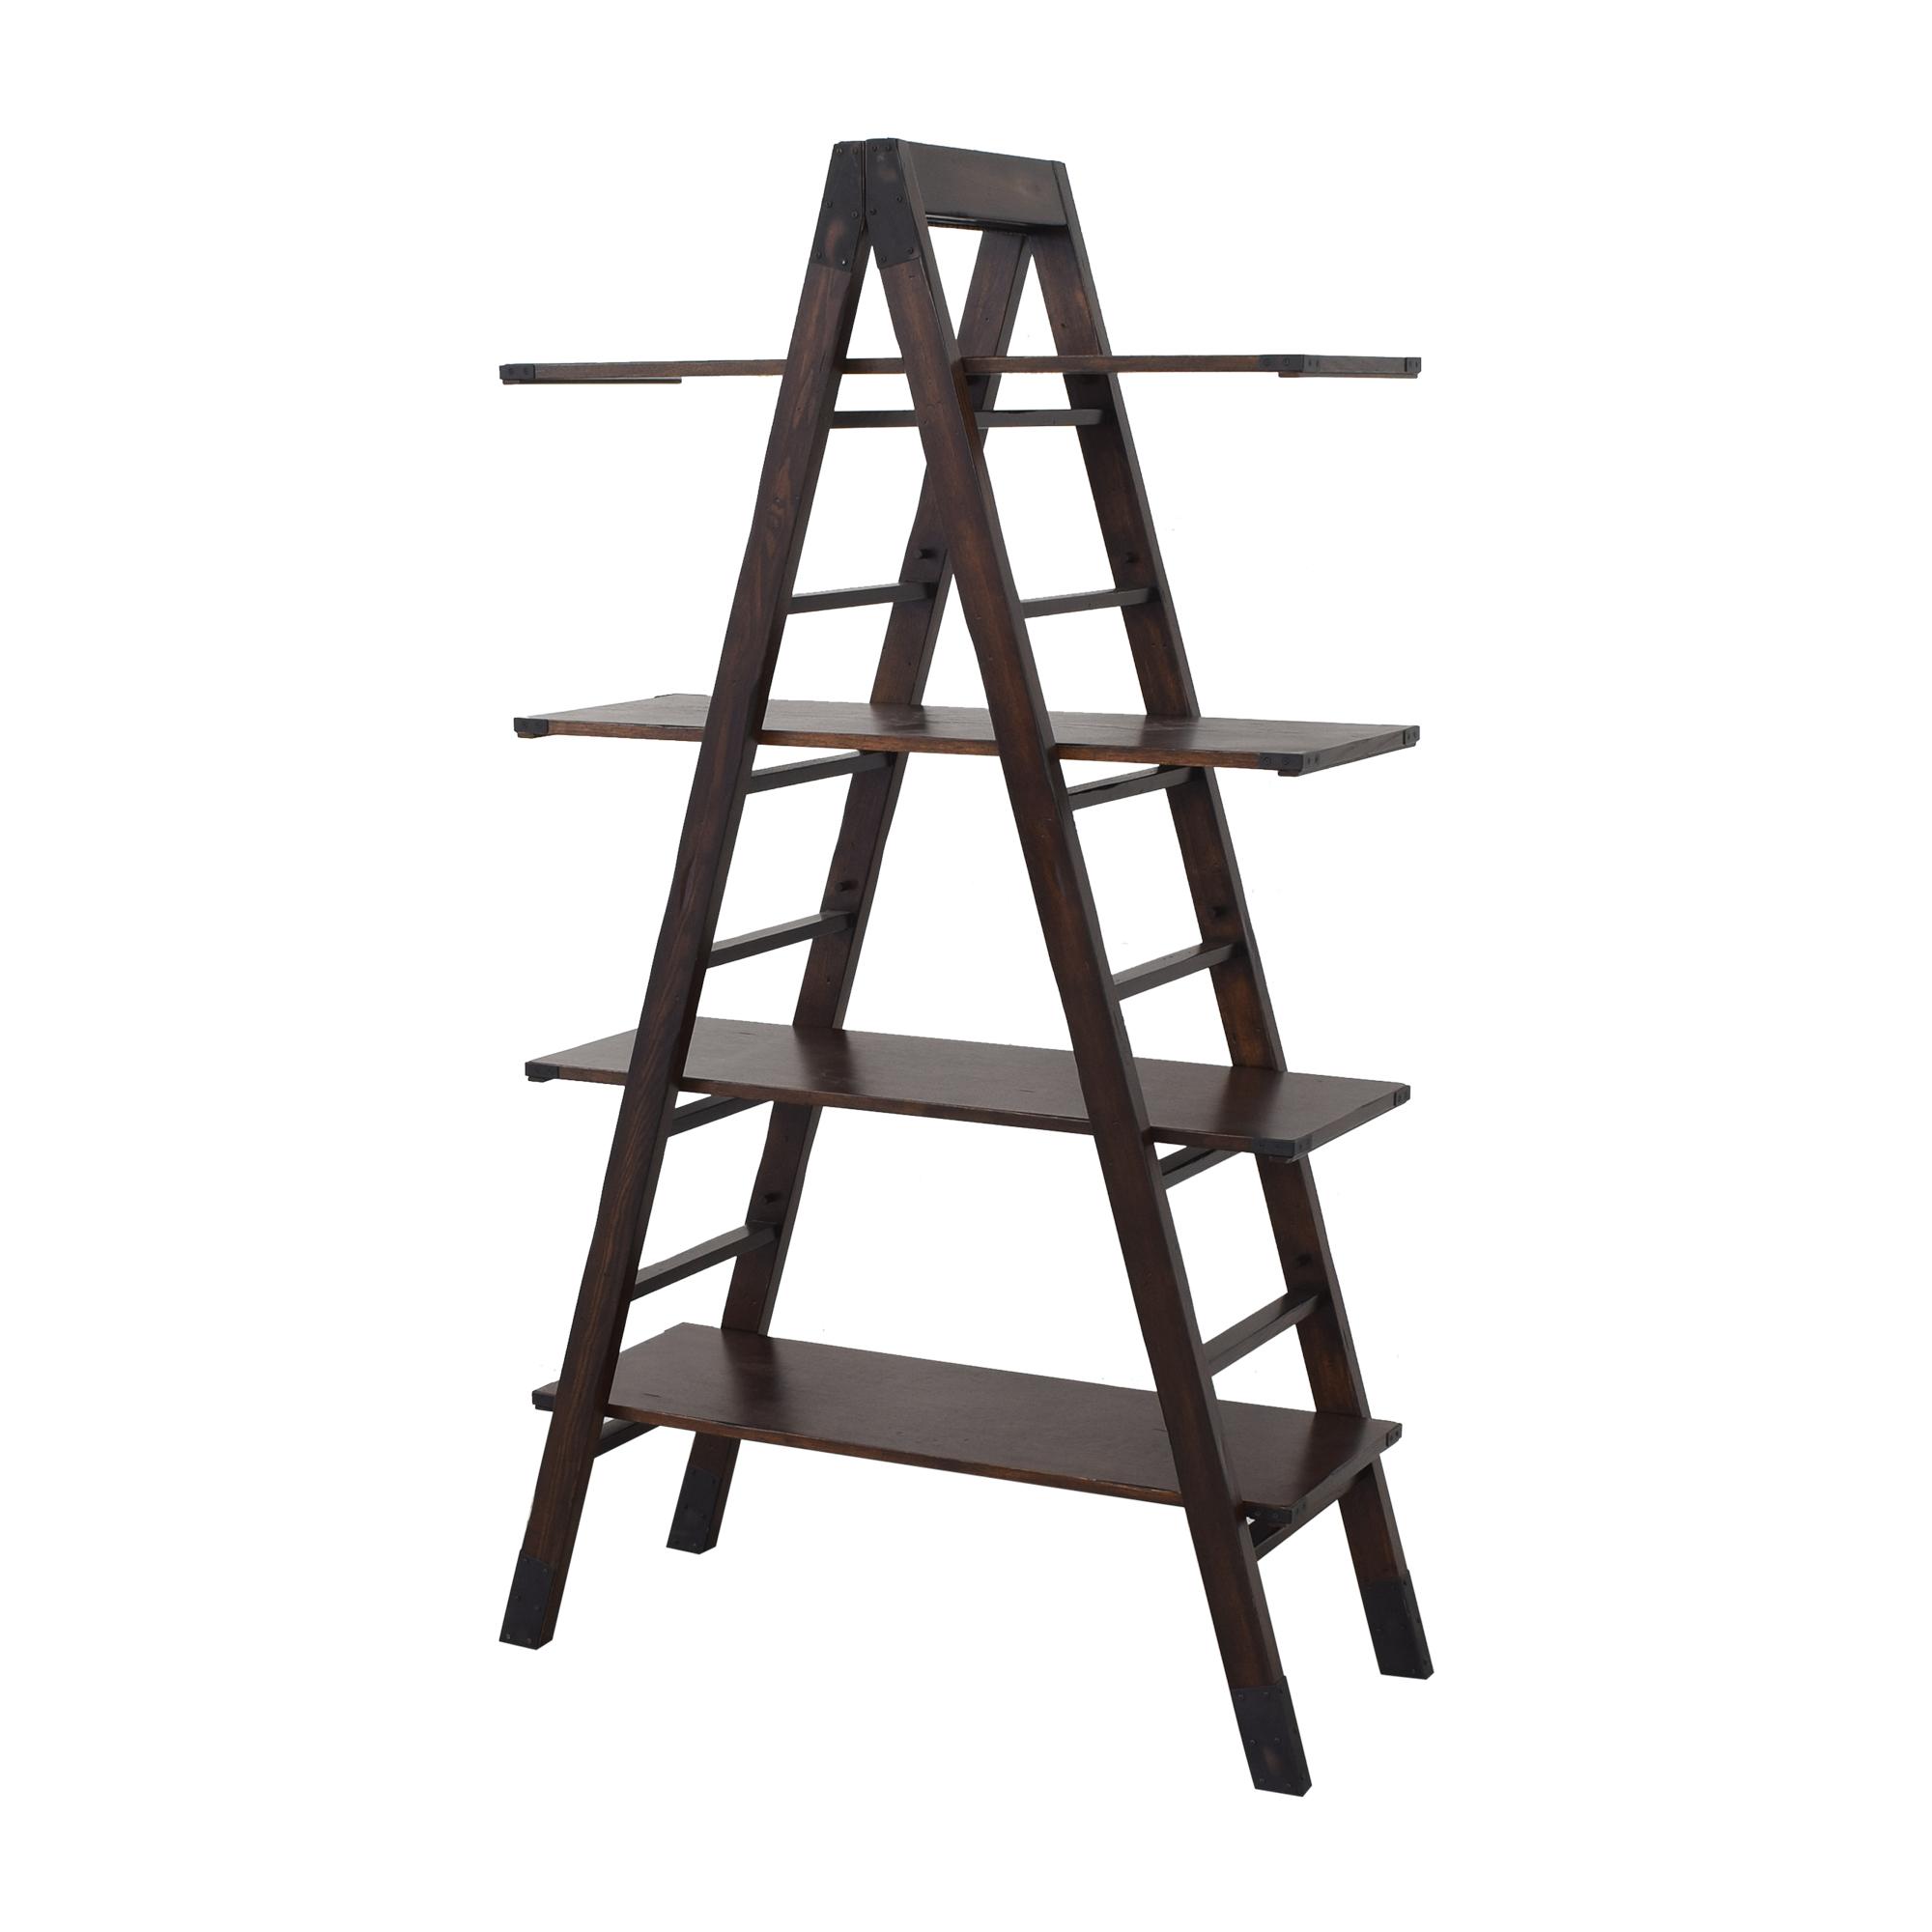 Z Gallerie Z Gallerie Ladder Shelf for sale